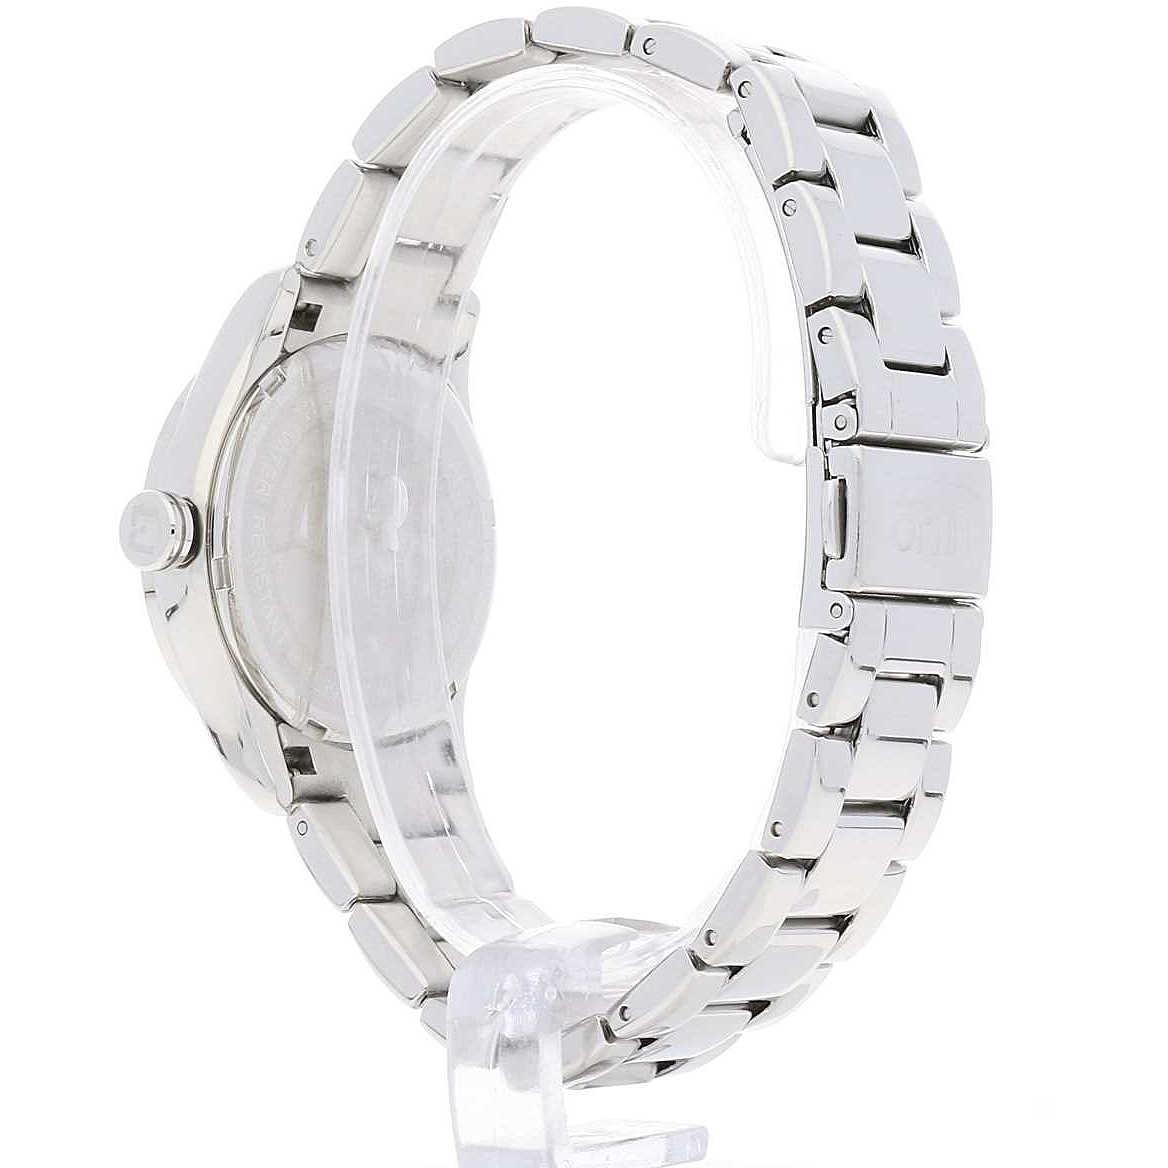 zoom. novità orologi donna Liujo TLJ938. zoom. acquista orologi donna Liujo  TLJ938. zoom. Confezione solo tempo Liujo TLJ938 c3f1d202f1b